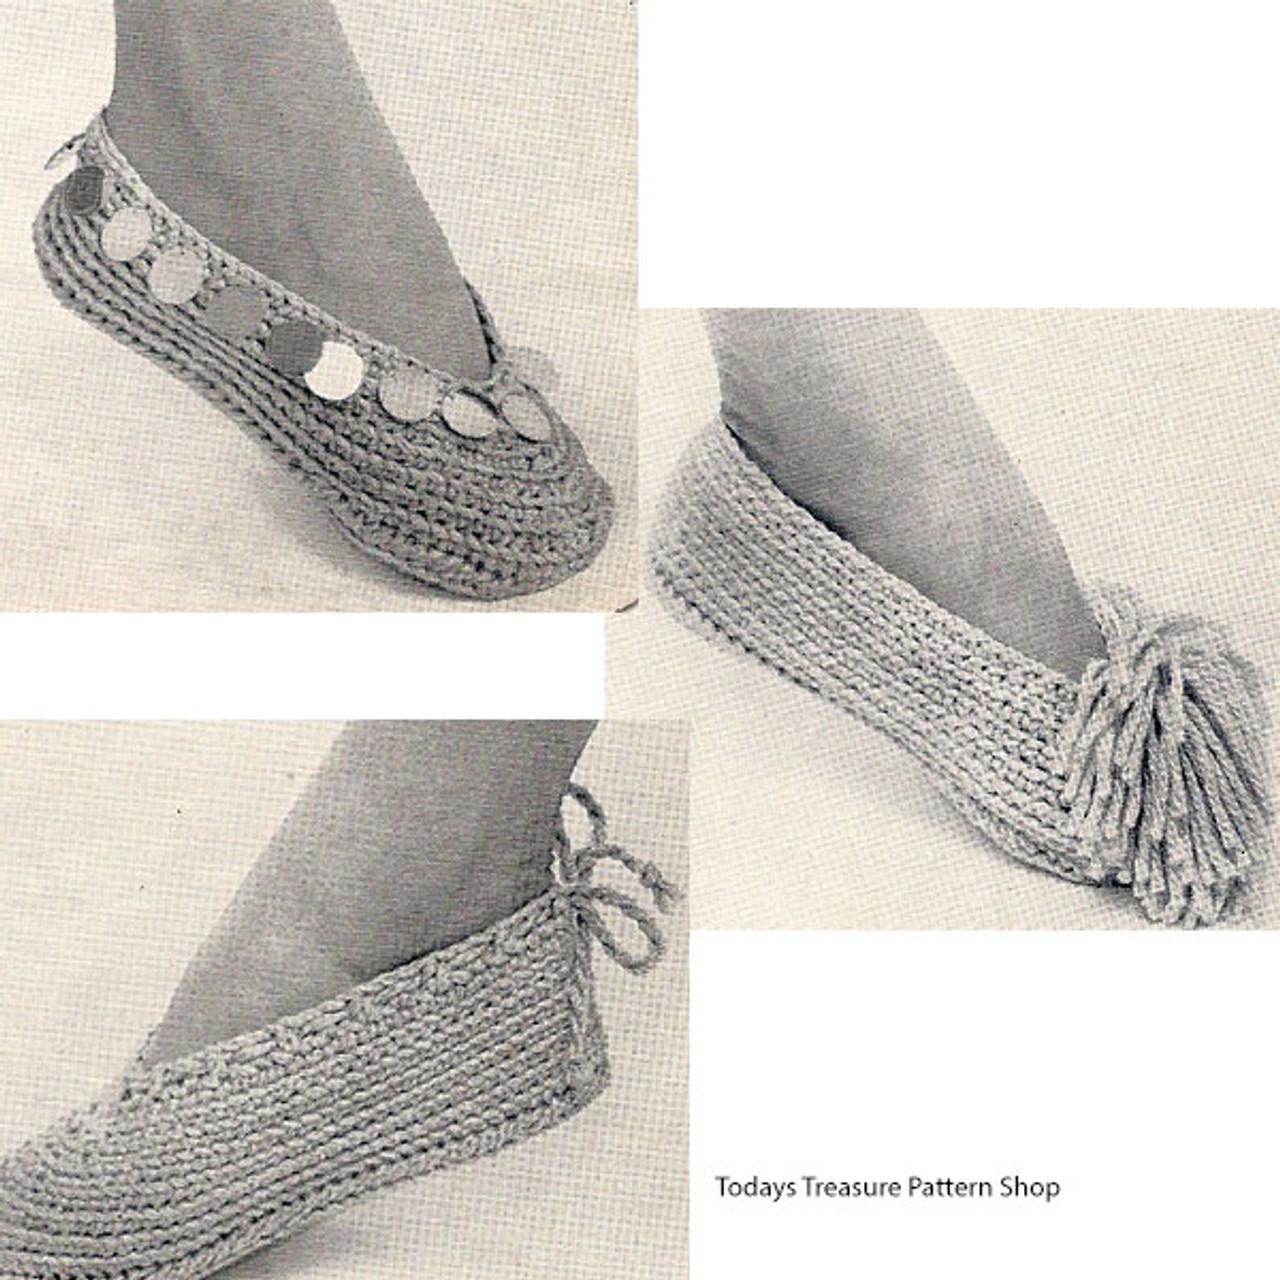 Easy Crochet Slippers Pattern from American Thread